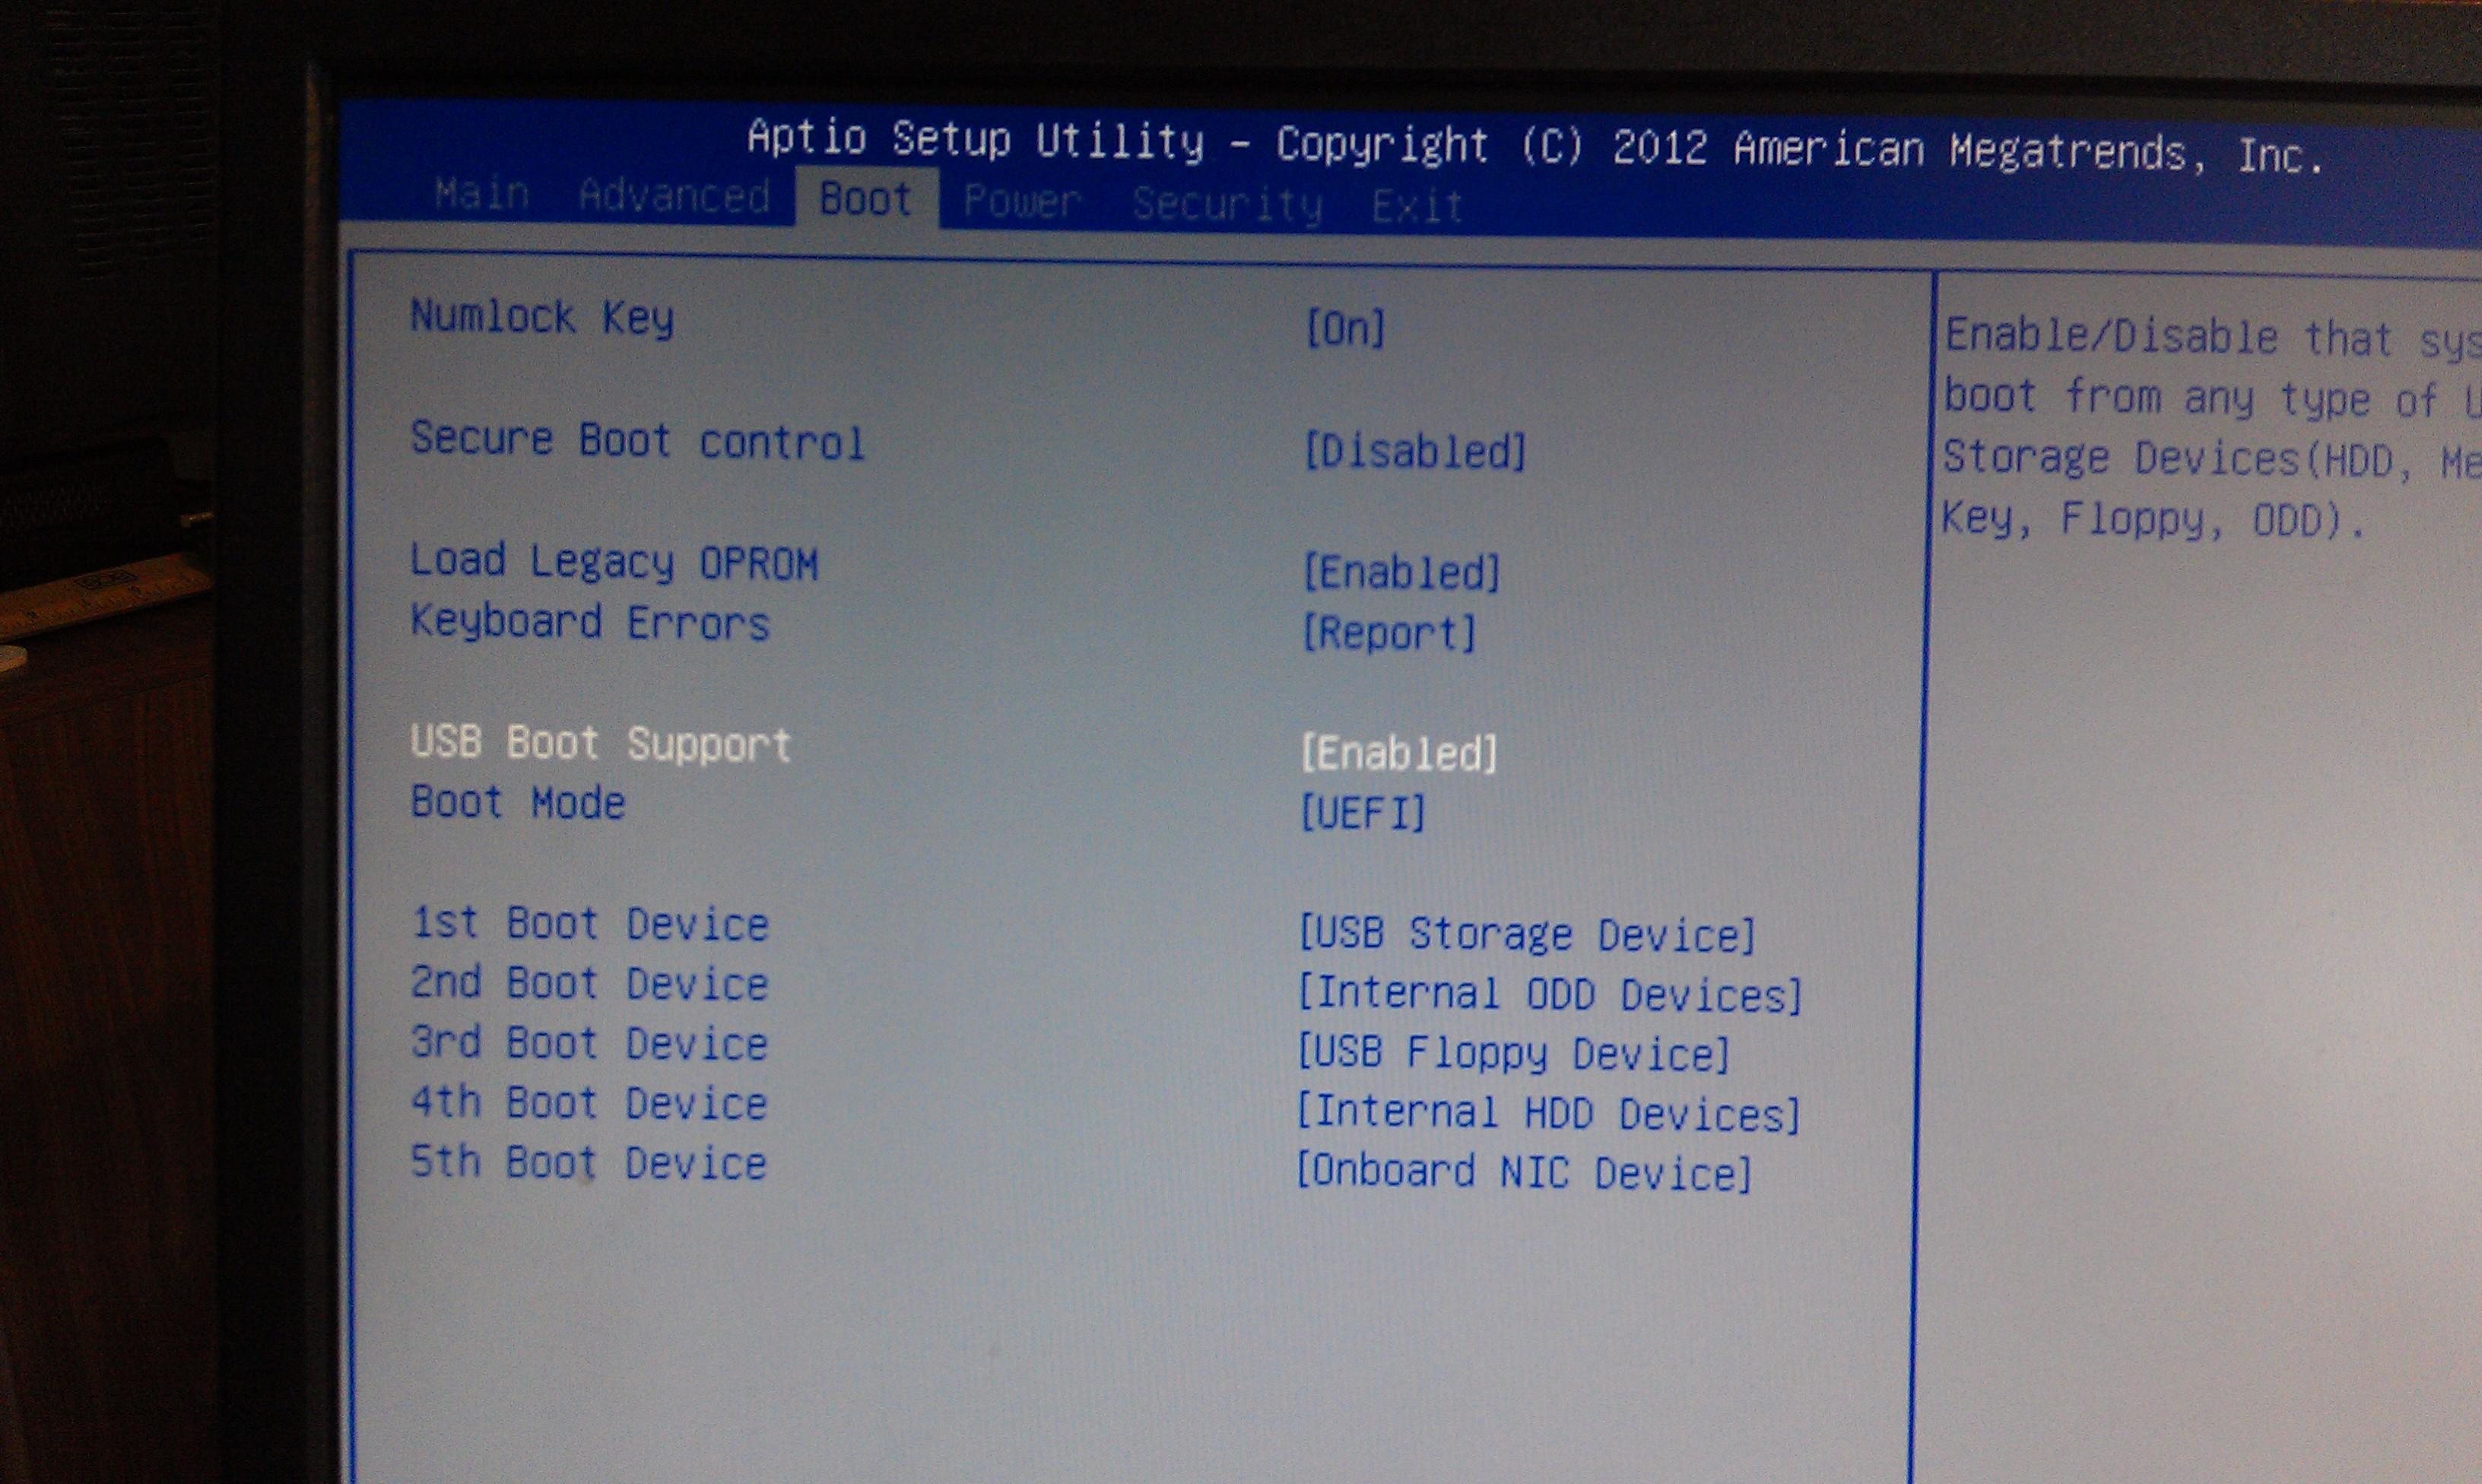 I use a Hiren's boot USB stick everyday in Latitudes, Optiplex, etc